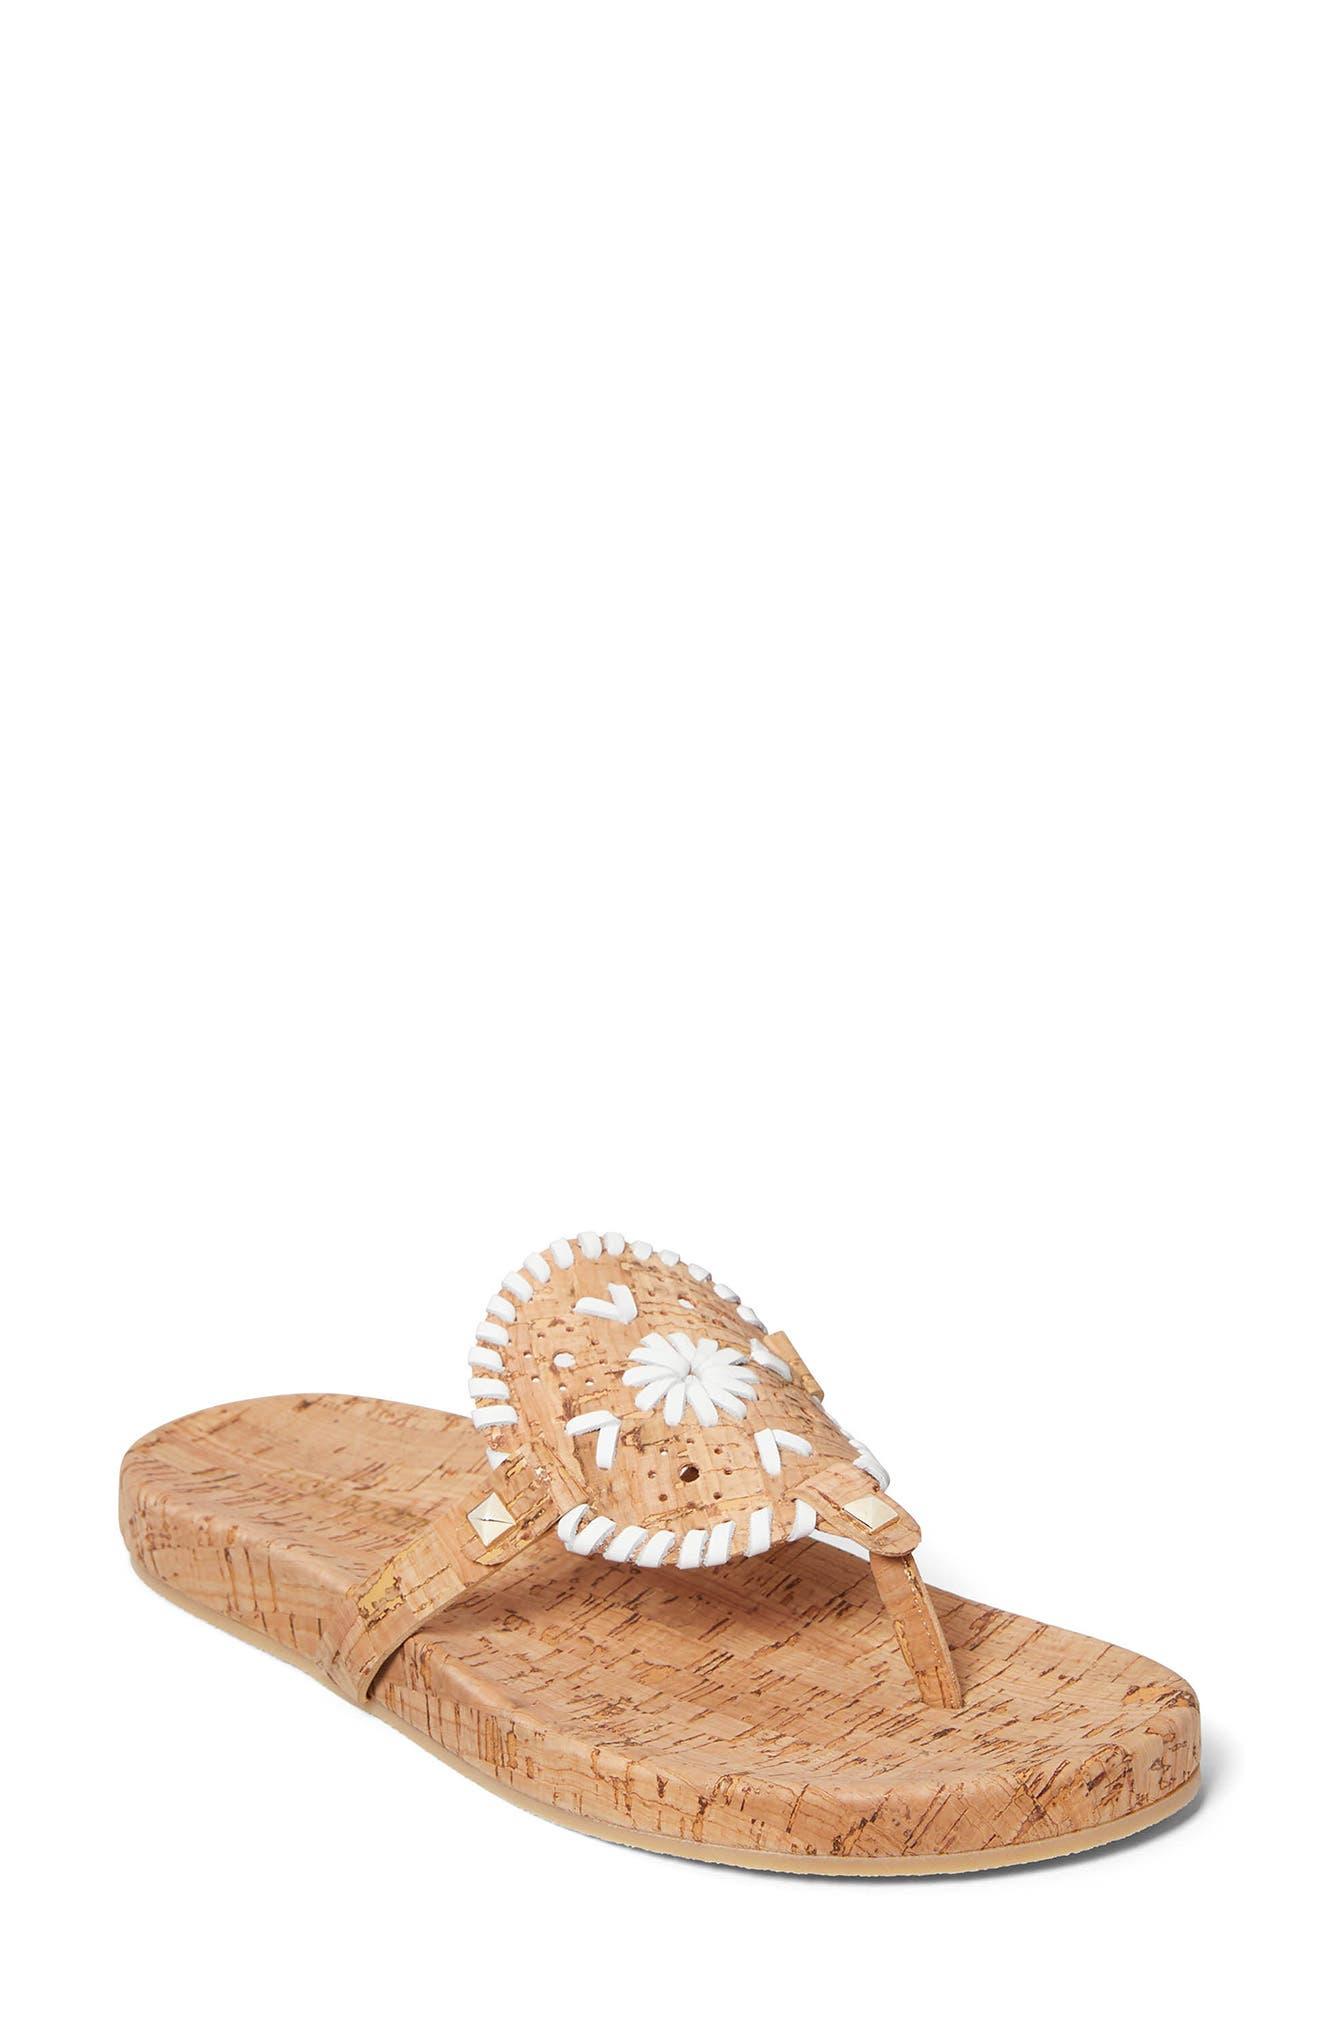 Georgica Cork Sandal